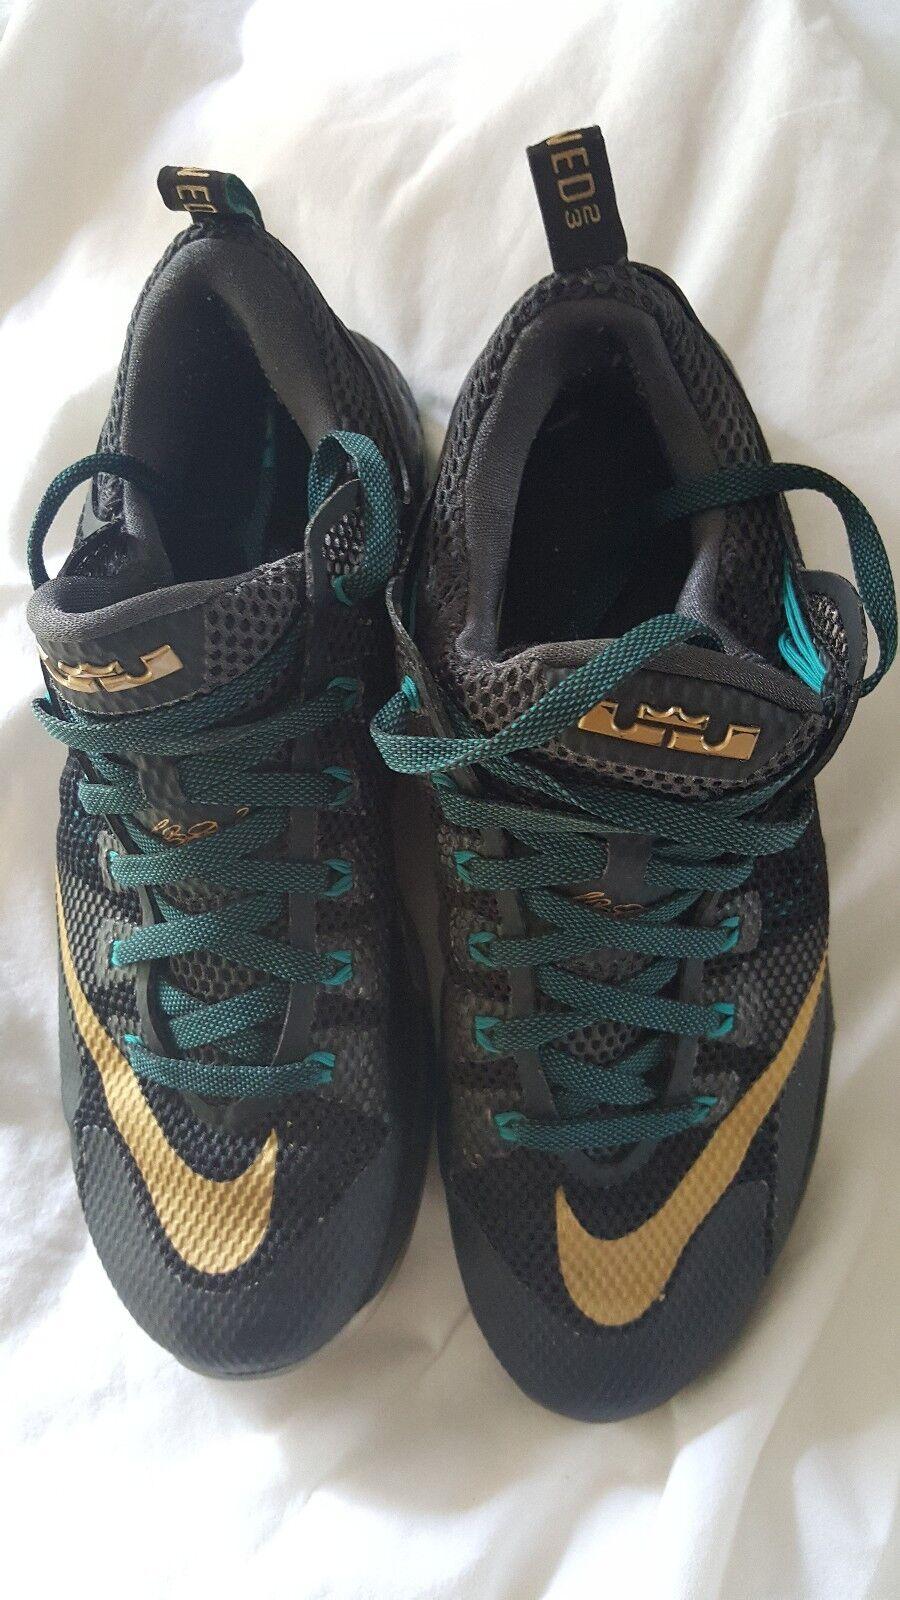 9837ad595f45 ... Nike Nike Nike Nike Nike Nike LeBron James XII Low